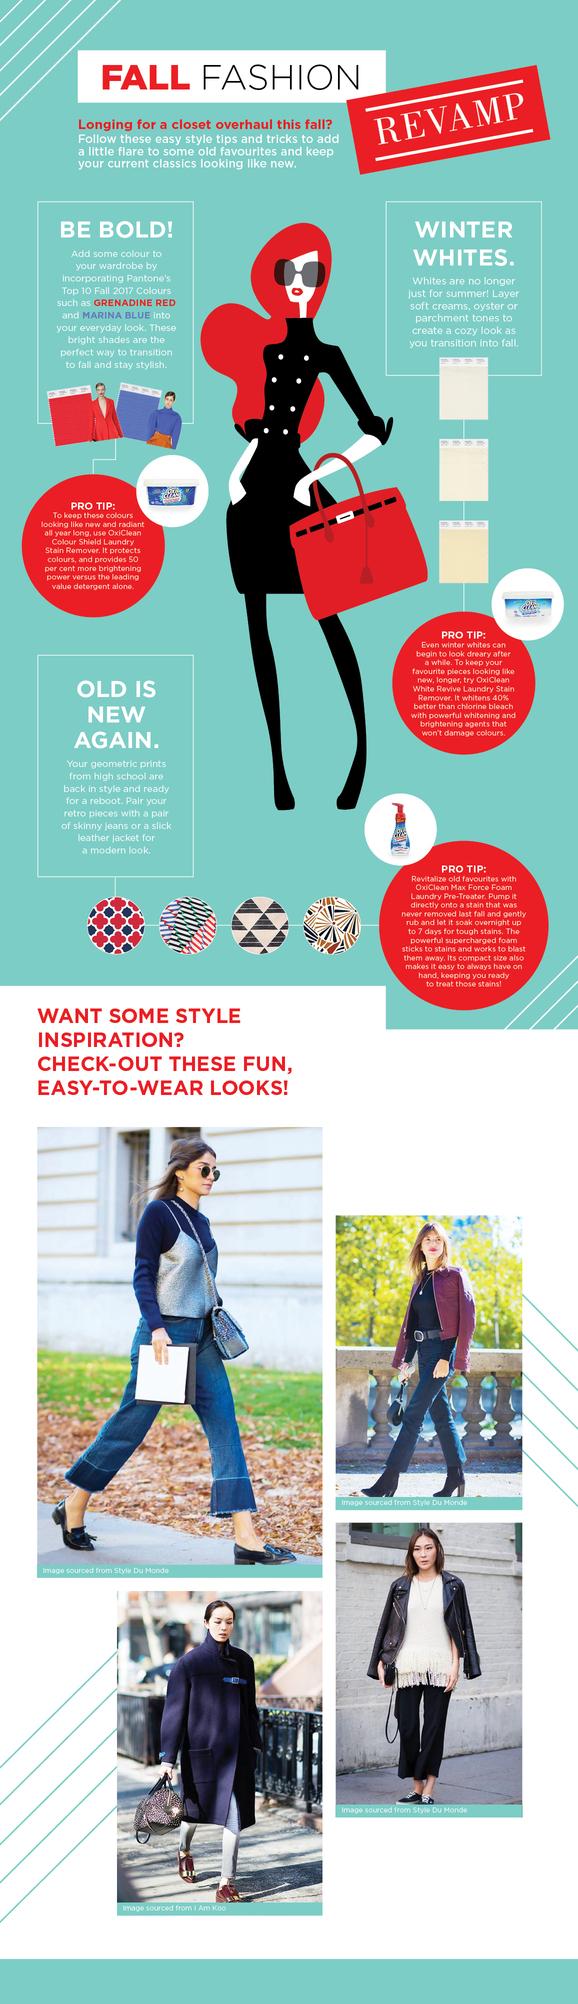 Fall Fashion Revamp Thrifty Mommas Tips